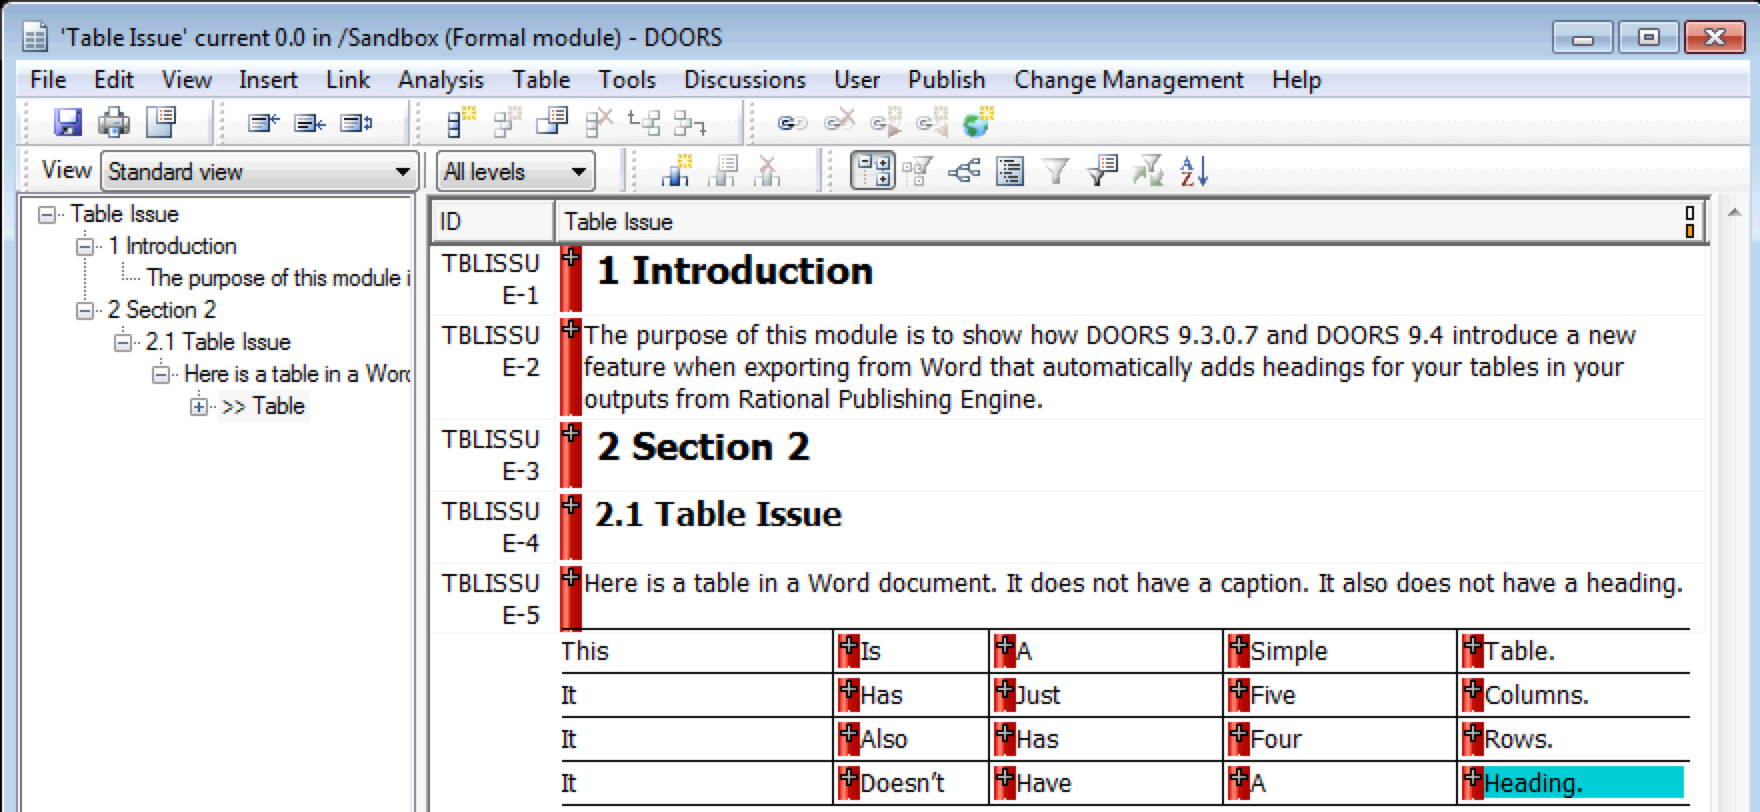 ]3 New DOORS Module based on Word Document  sc 1 st  Baselines Inc. & Baselines Inc. DOORS Archives - Baselines Inc.